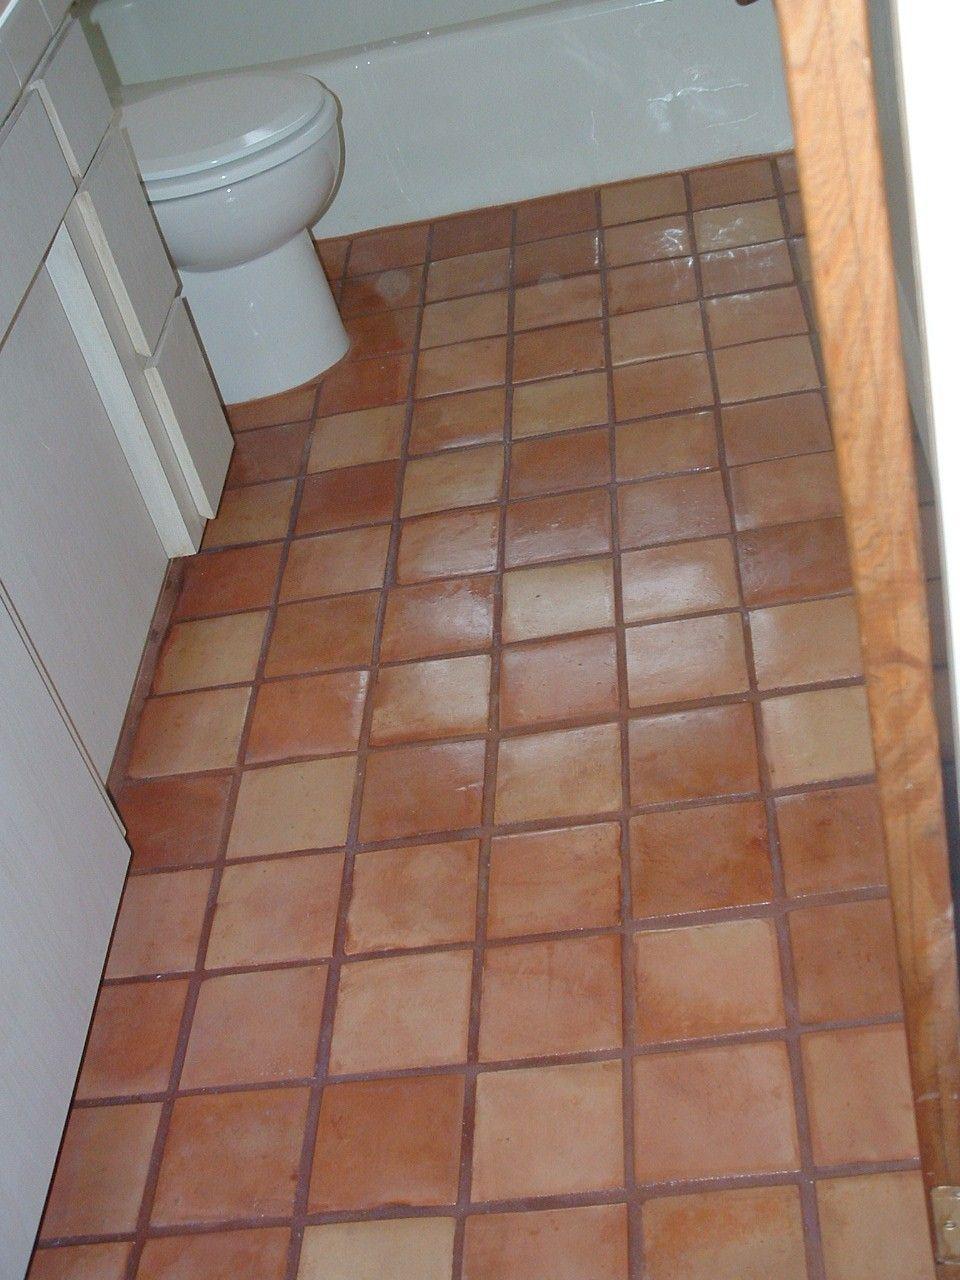 Best Bathroom Stone Floor Tiles Suppliers Online Shop In Lahore Punjab Pakistan Add The Right Stone Floor Bathroom Eclectic Bathroom Design Amazing Bathrooms